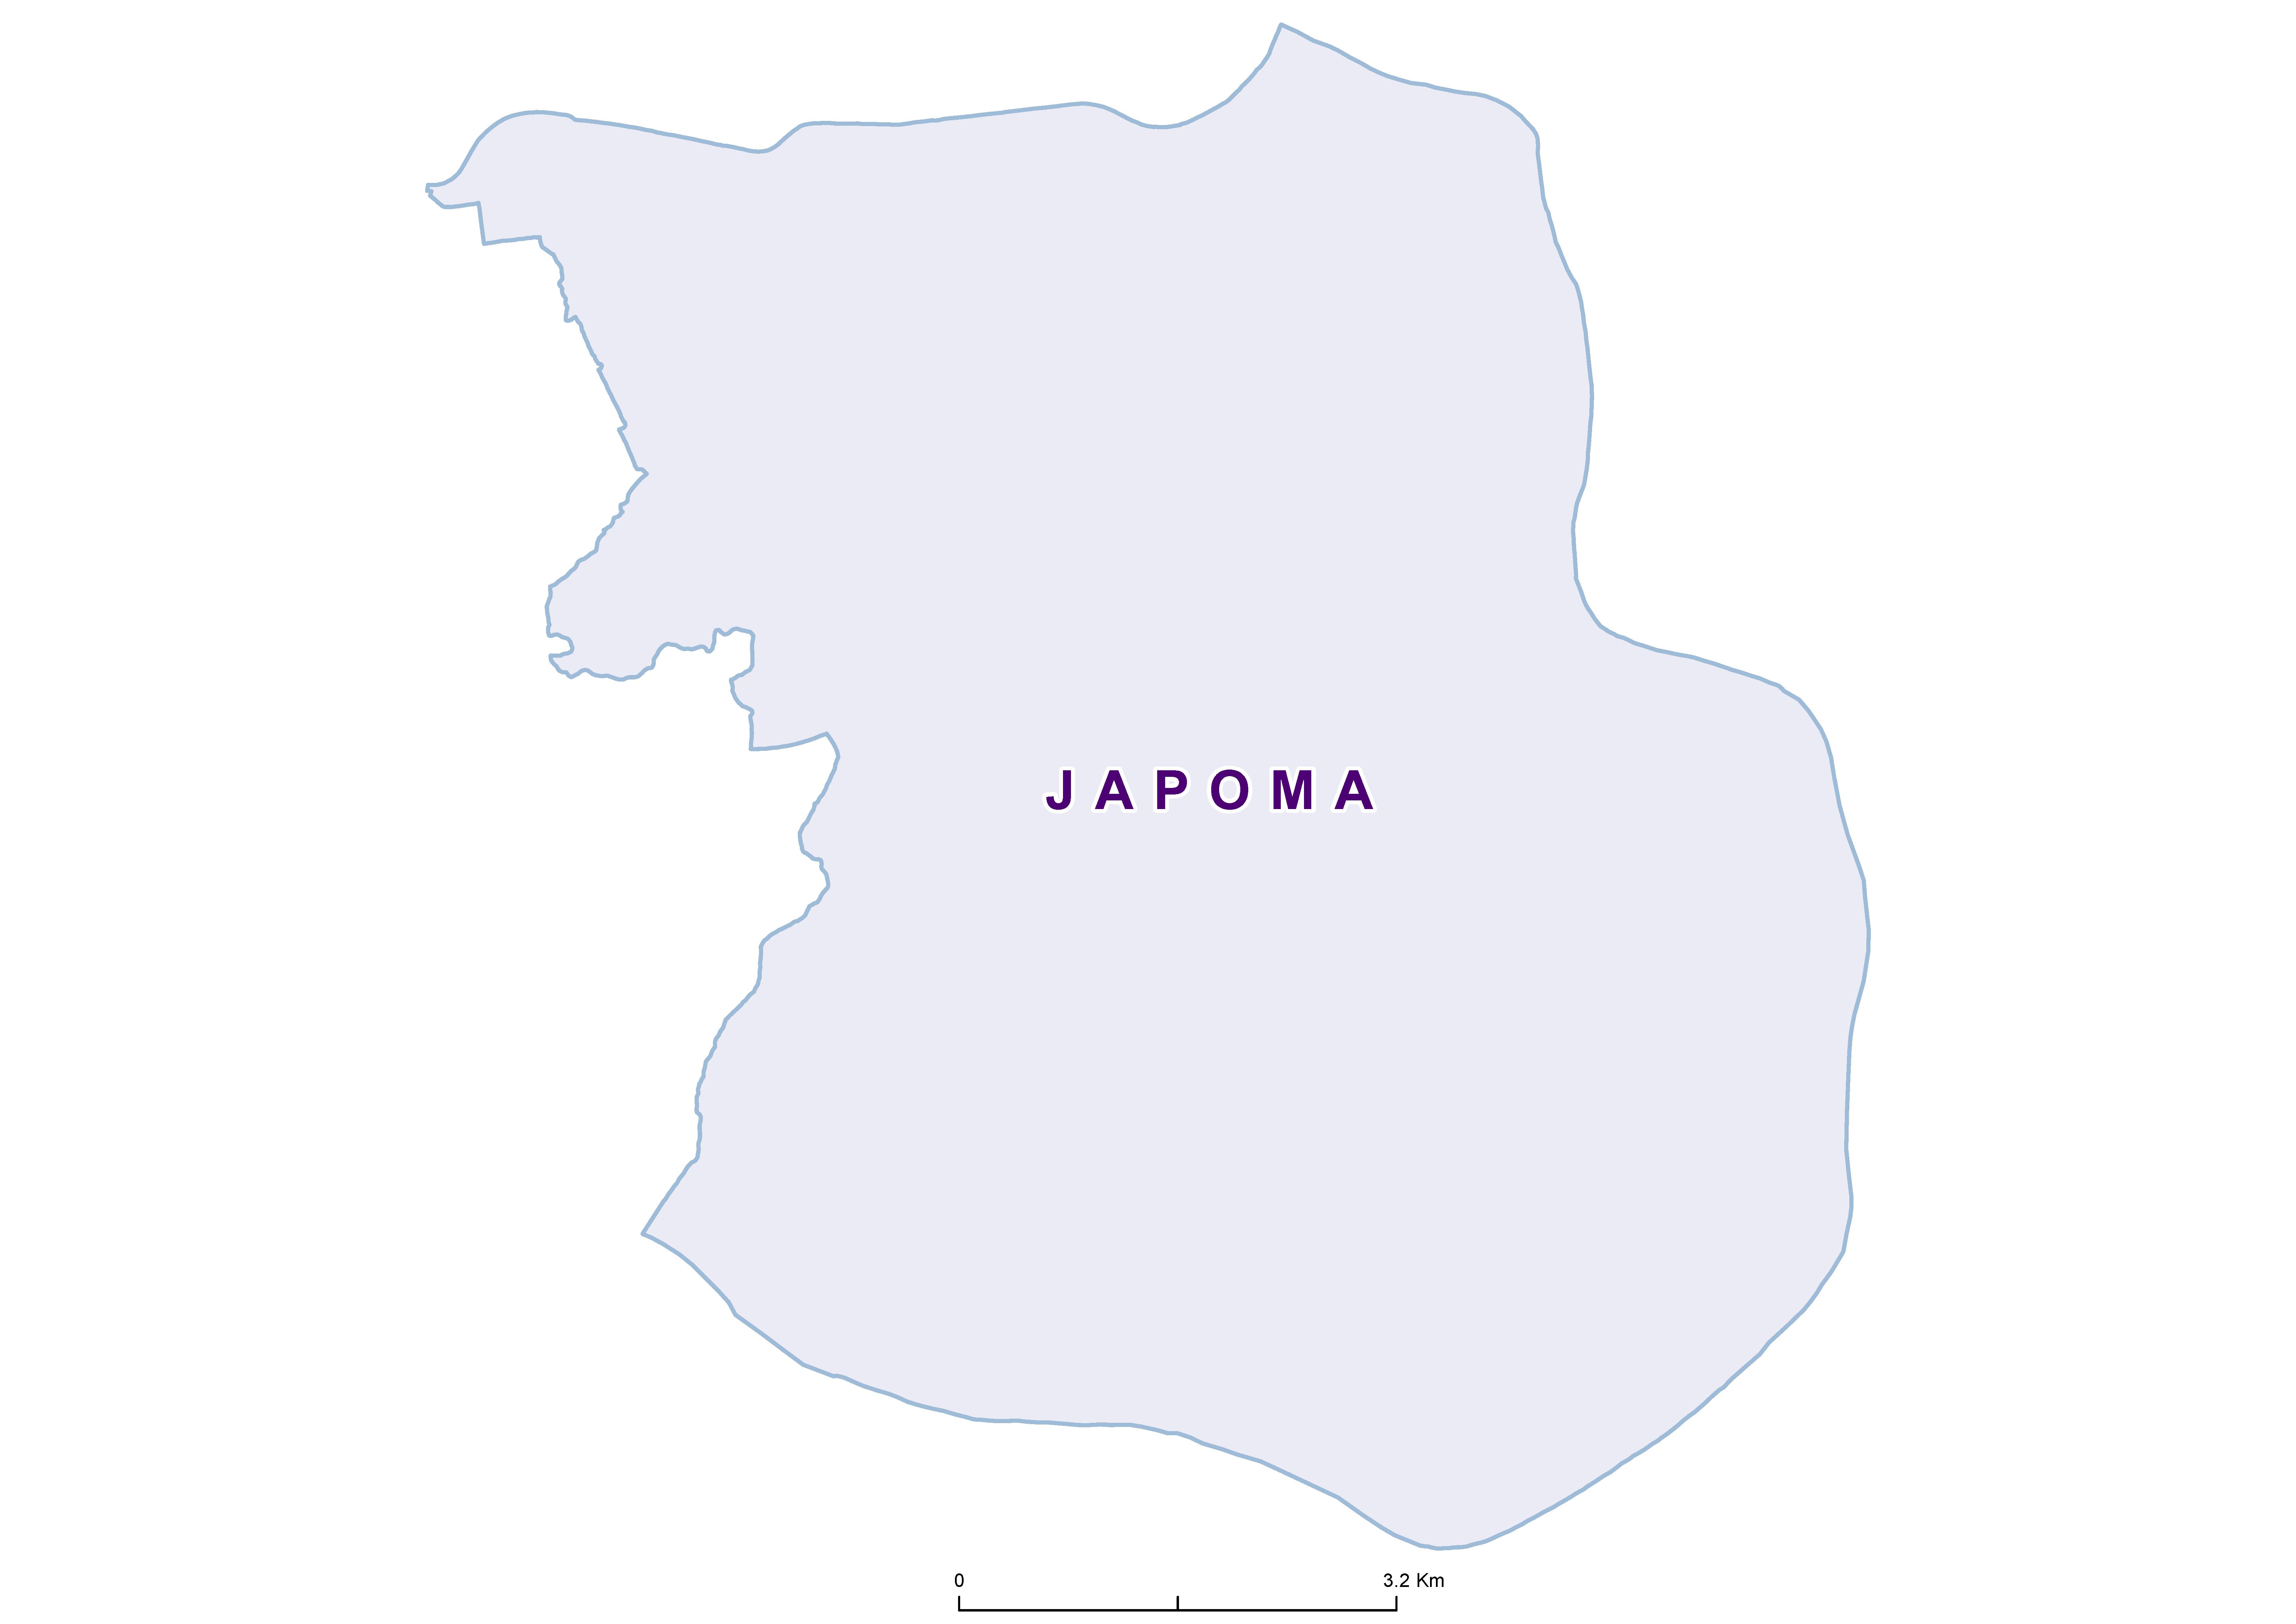 Japoma Mean STH 20180001